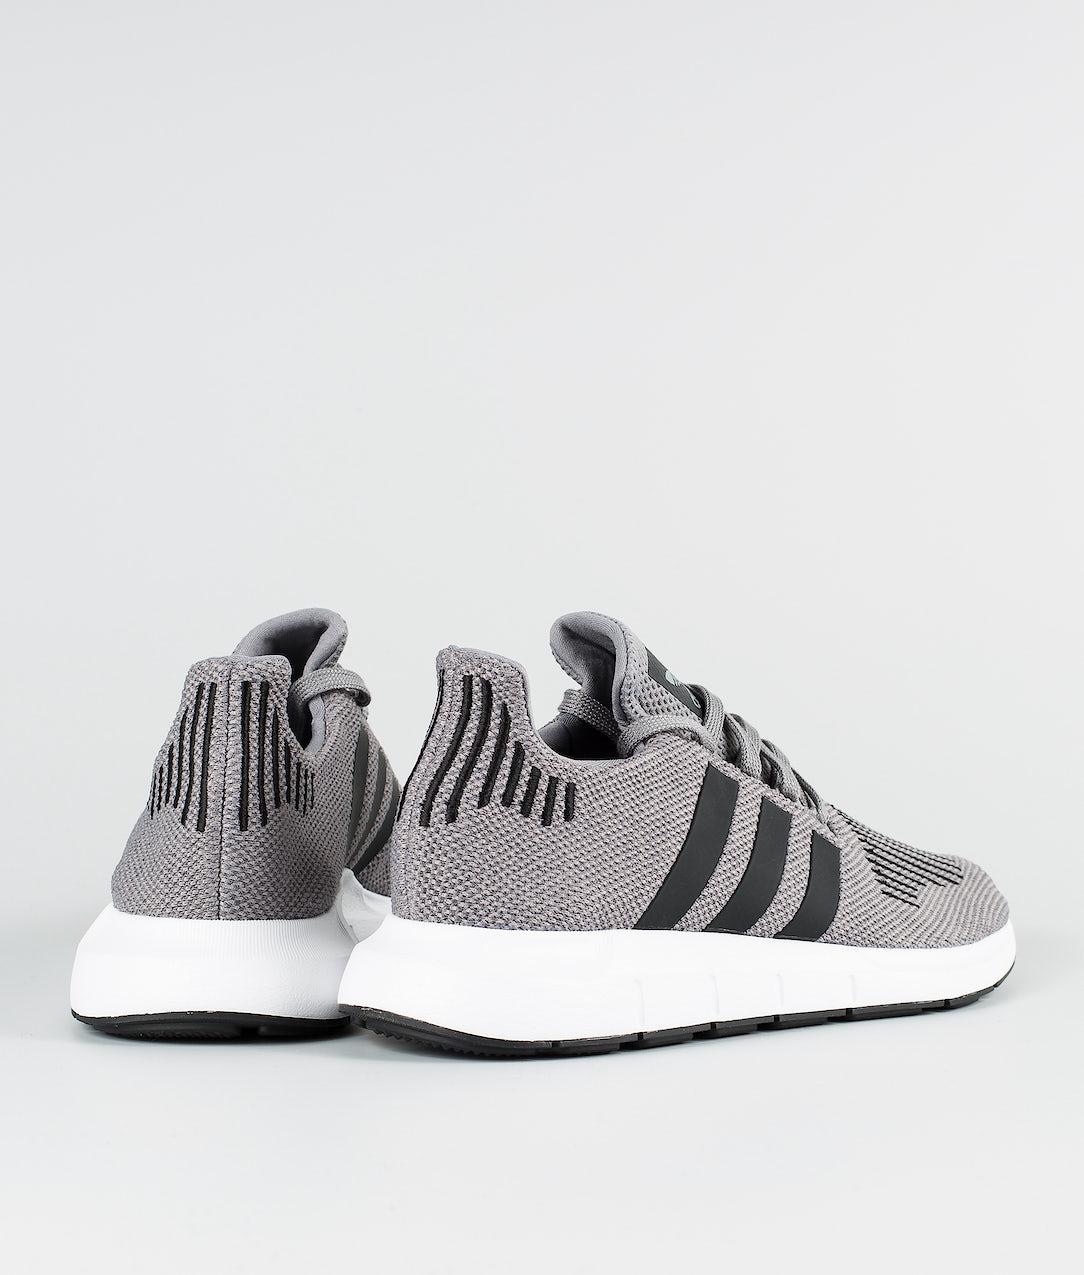 sports shoes 45632 9b14d Adidas Originals Swift Run Schuhe Grey Heather/Core Black/Medium Grey  Heather